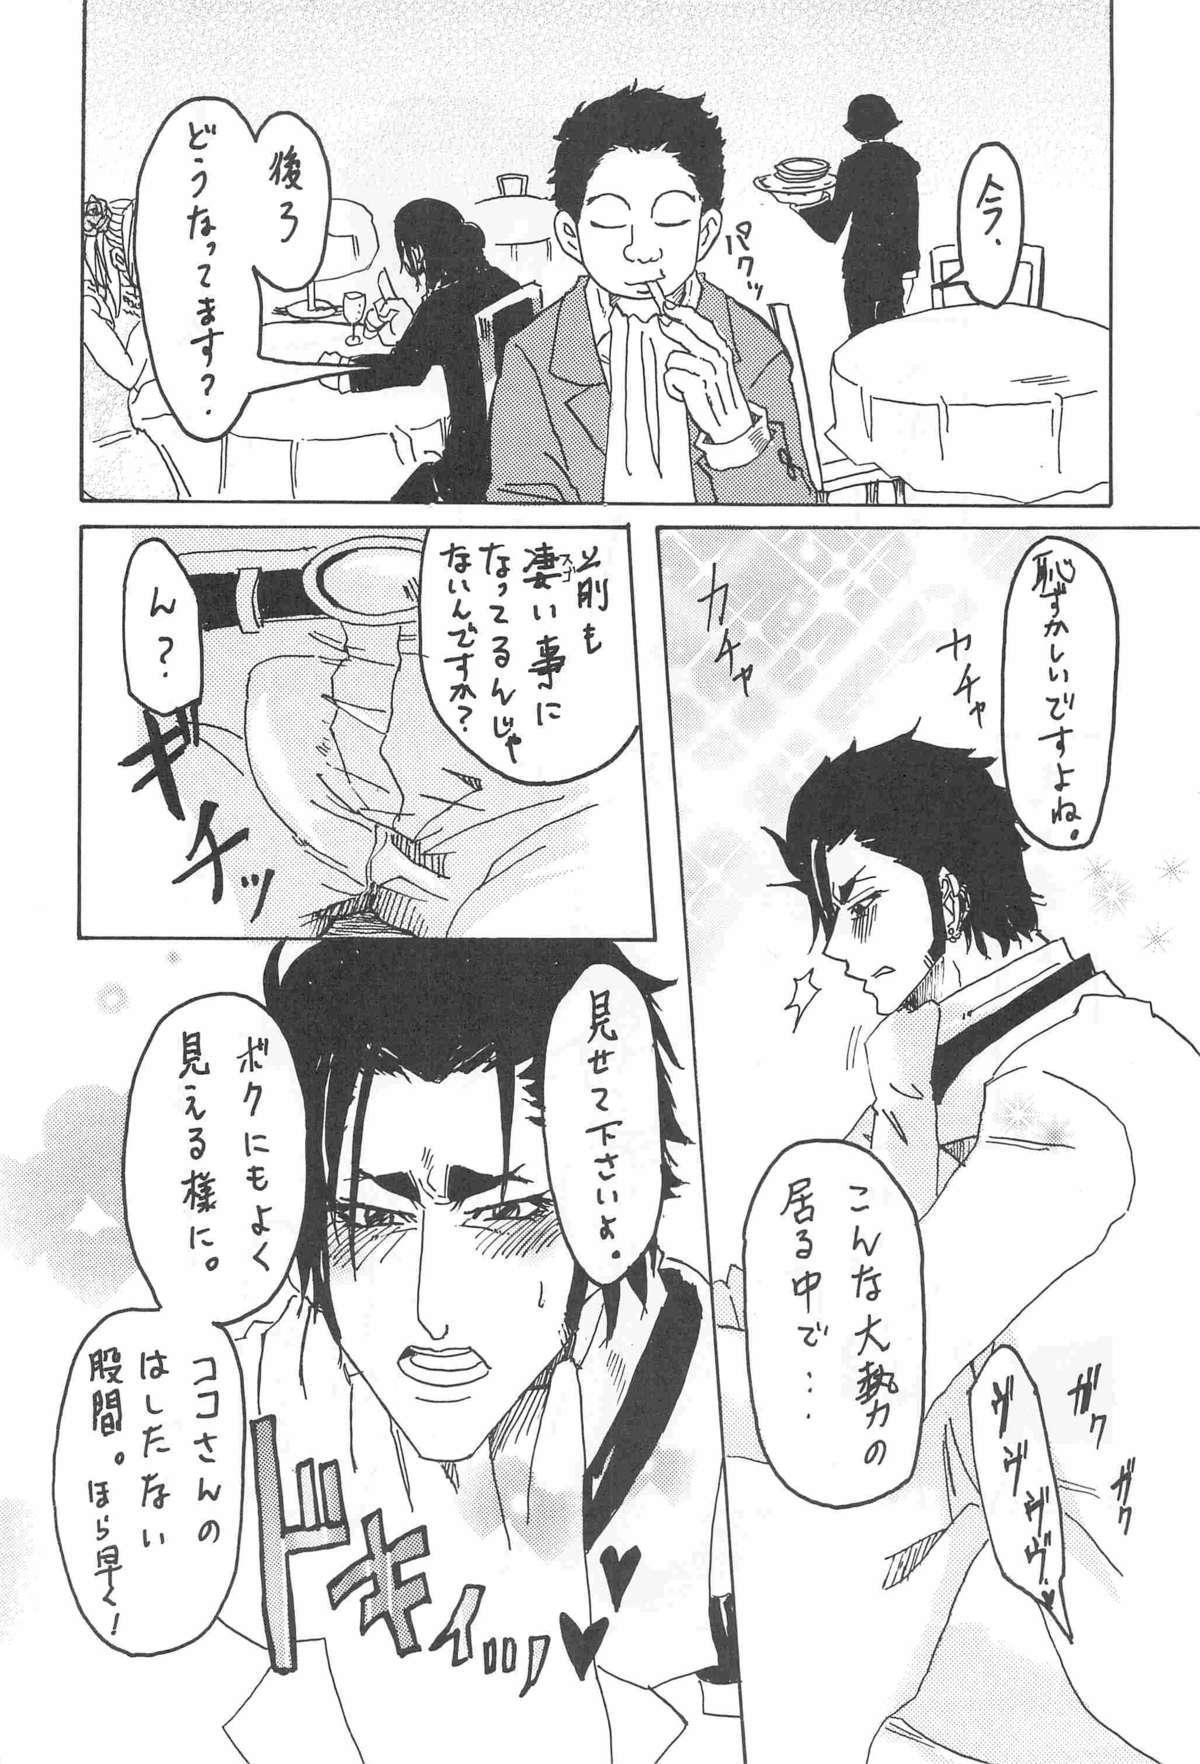 [Kijima Hyougo,Jun'ai Meringue-don,RIN!] [msbt] (Toriko) 7